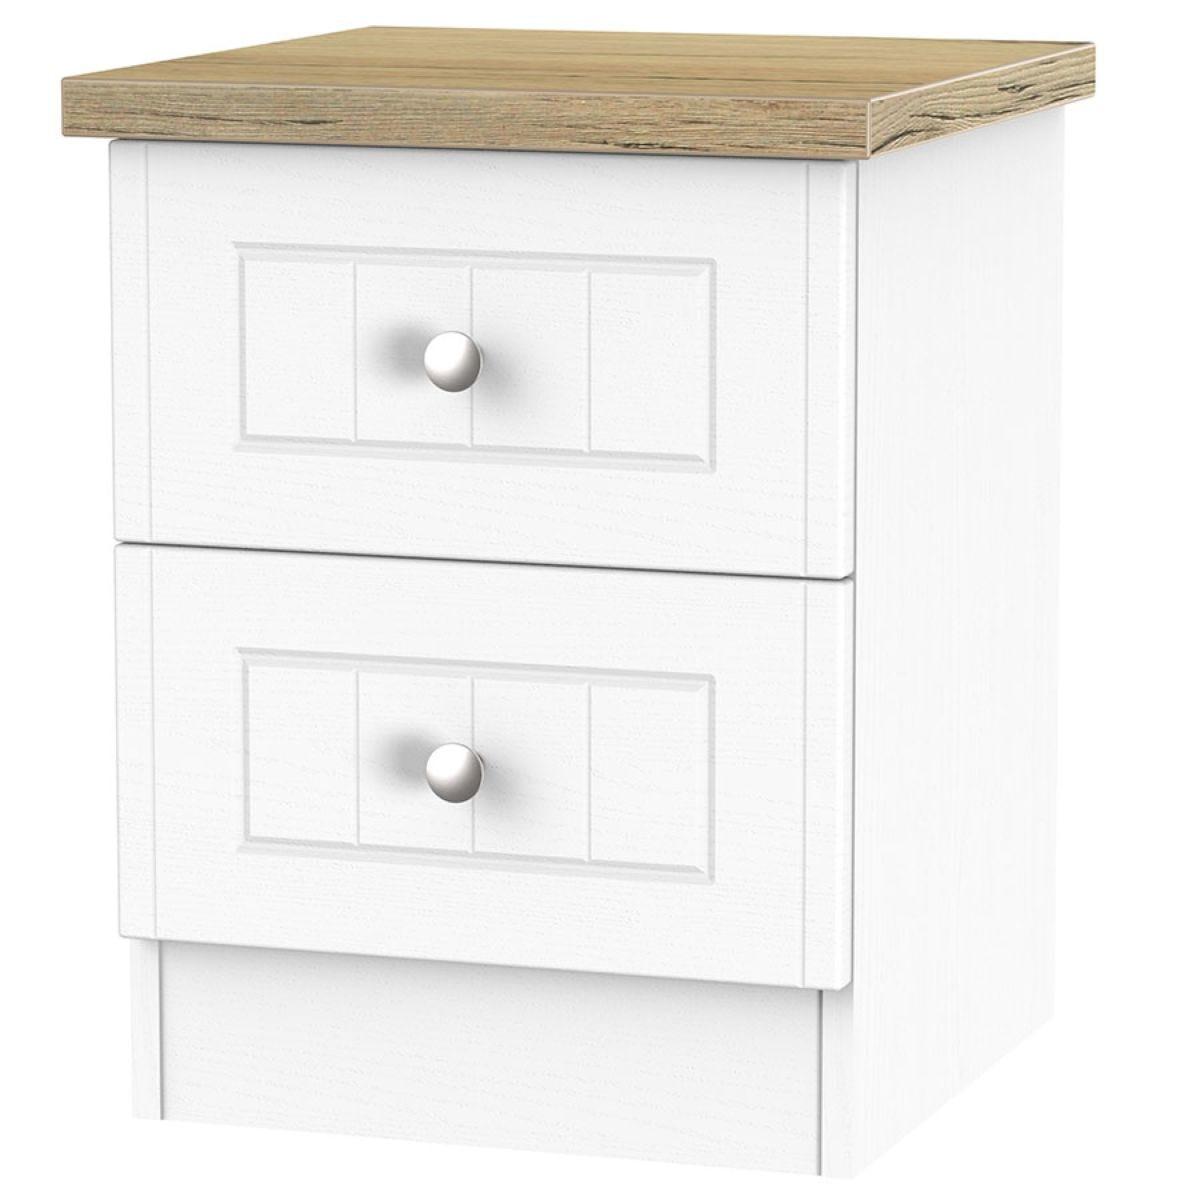 Wilcox 2-Drawer Bedside Table - Porcelain Ash